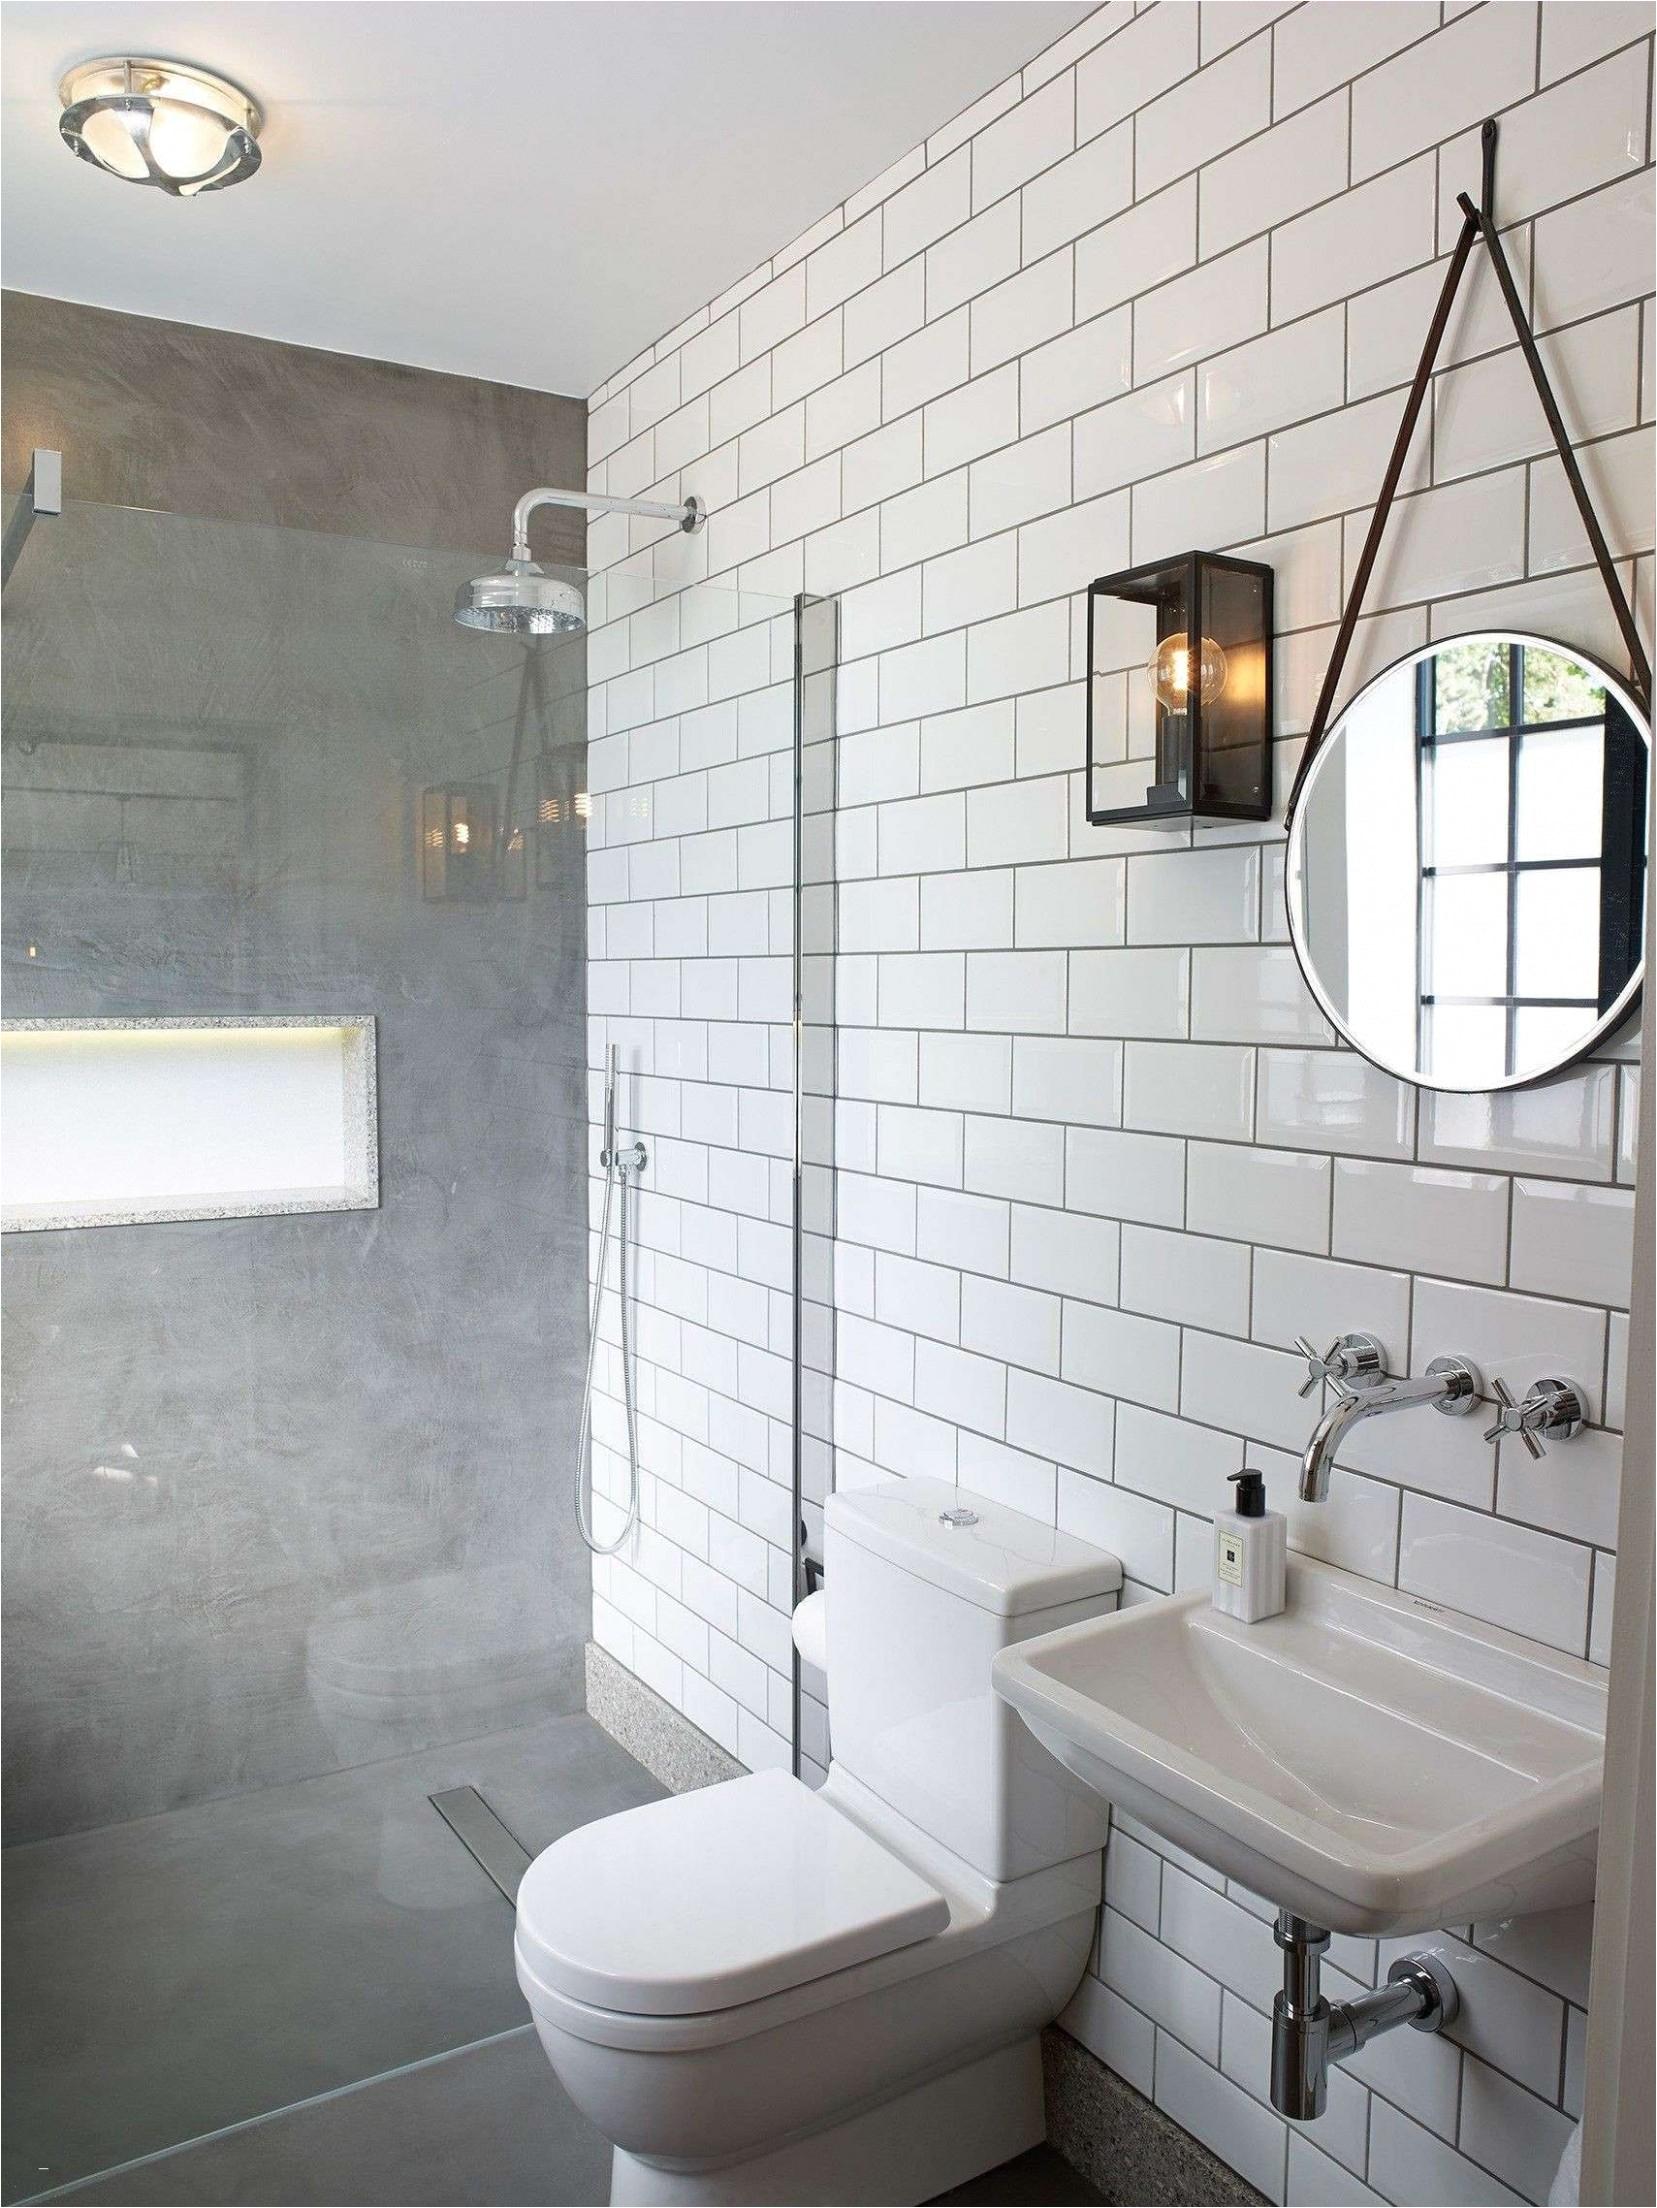 Channel 4 Bathroom Design Ideas Fabulous Chanel Bathroom Ideas